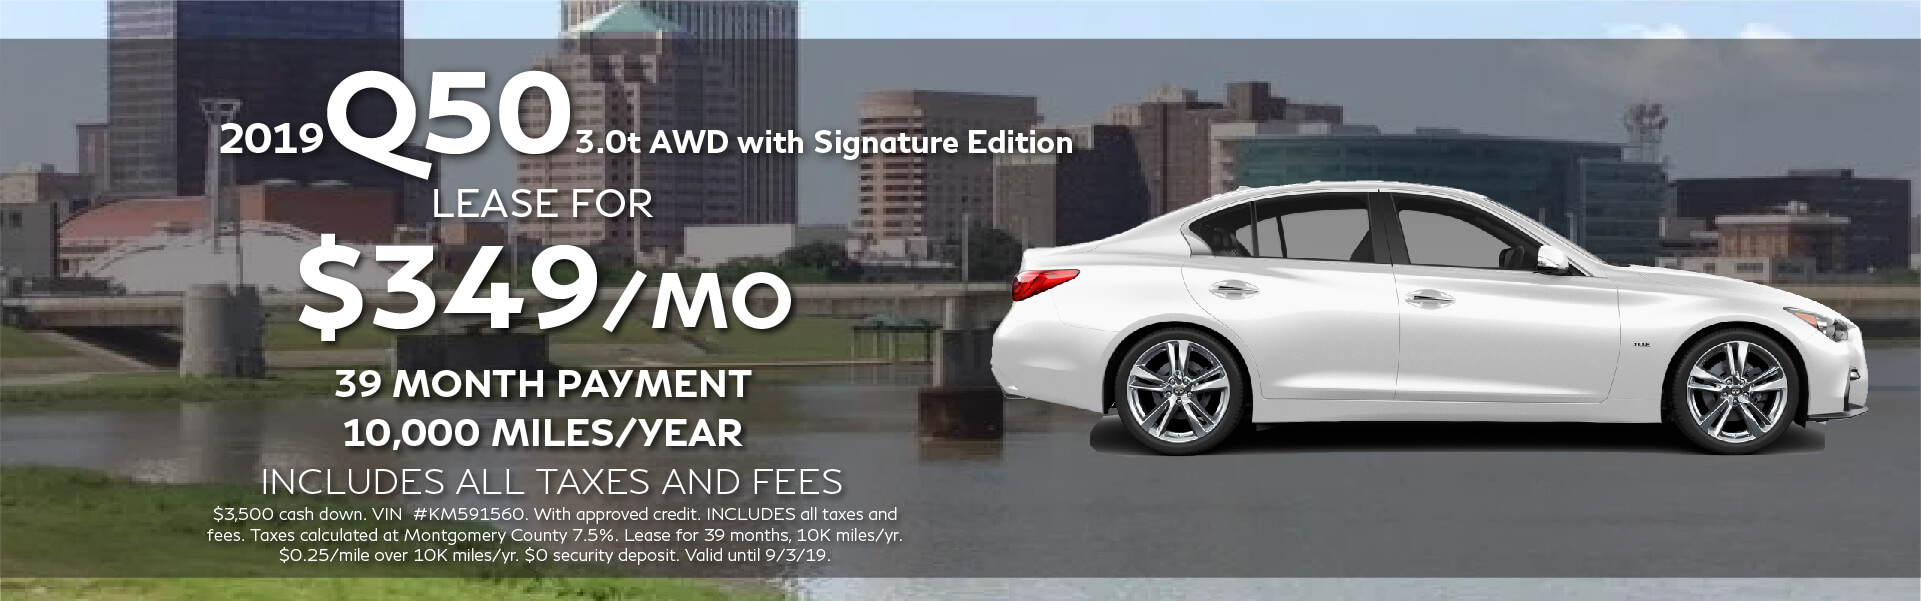 Q50 Signature Edition - Lease for $349